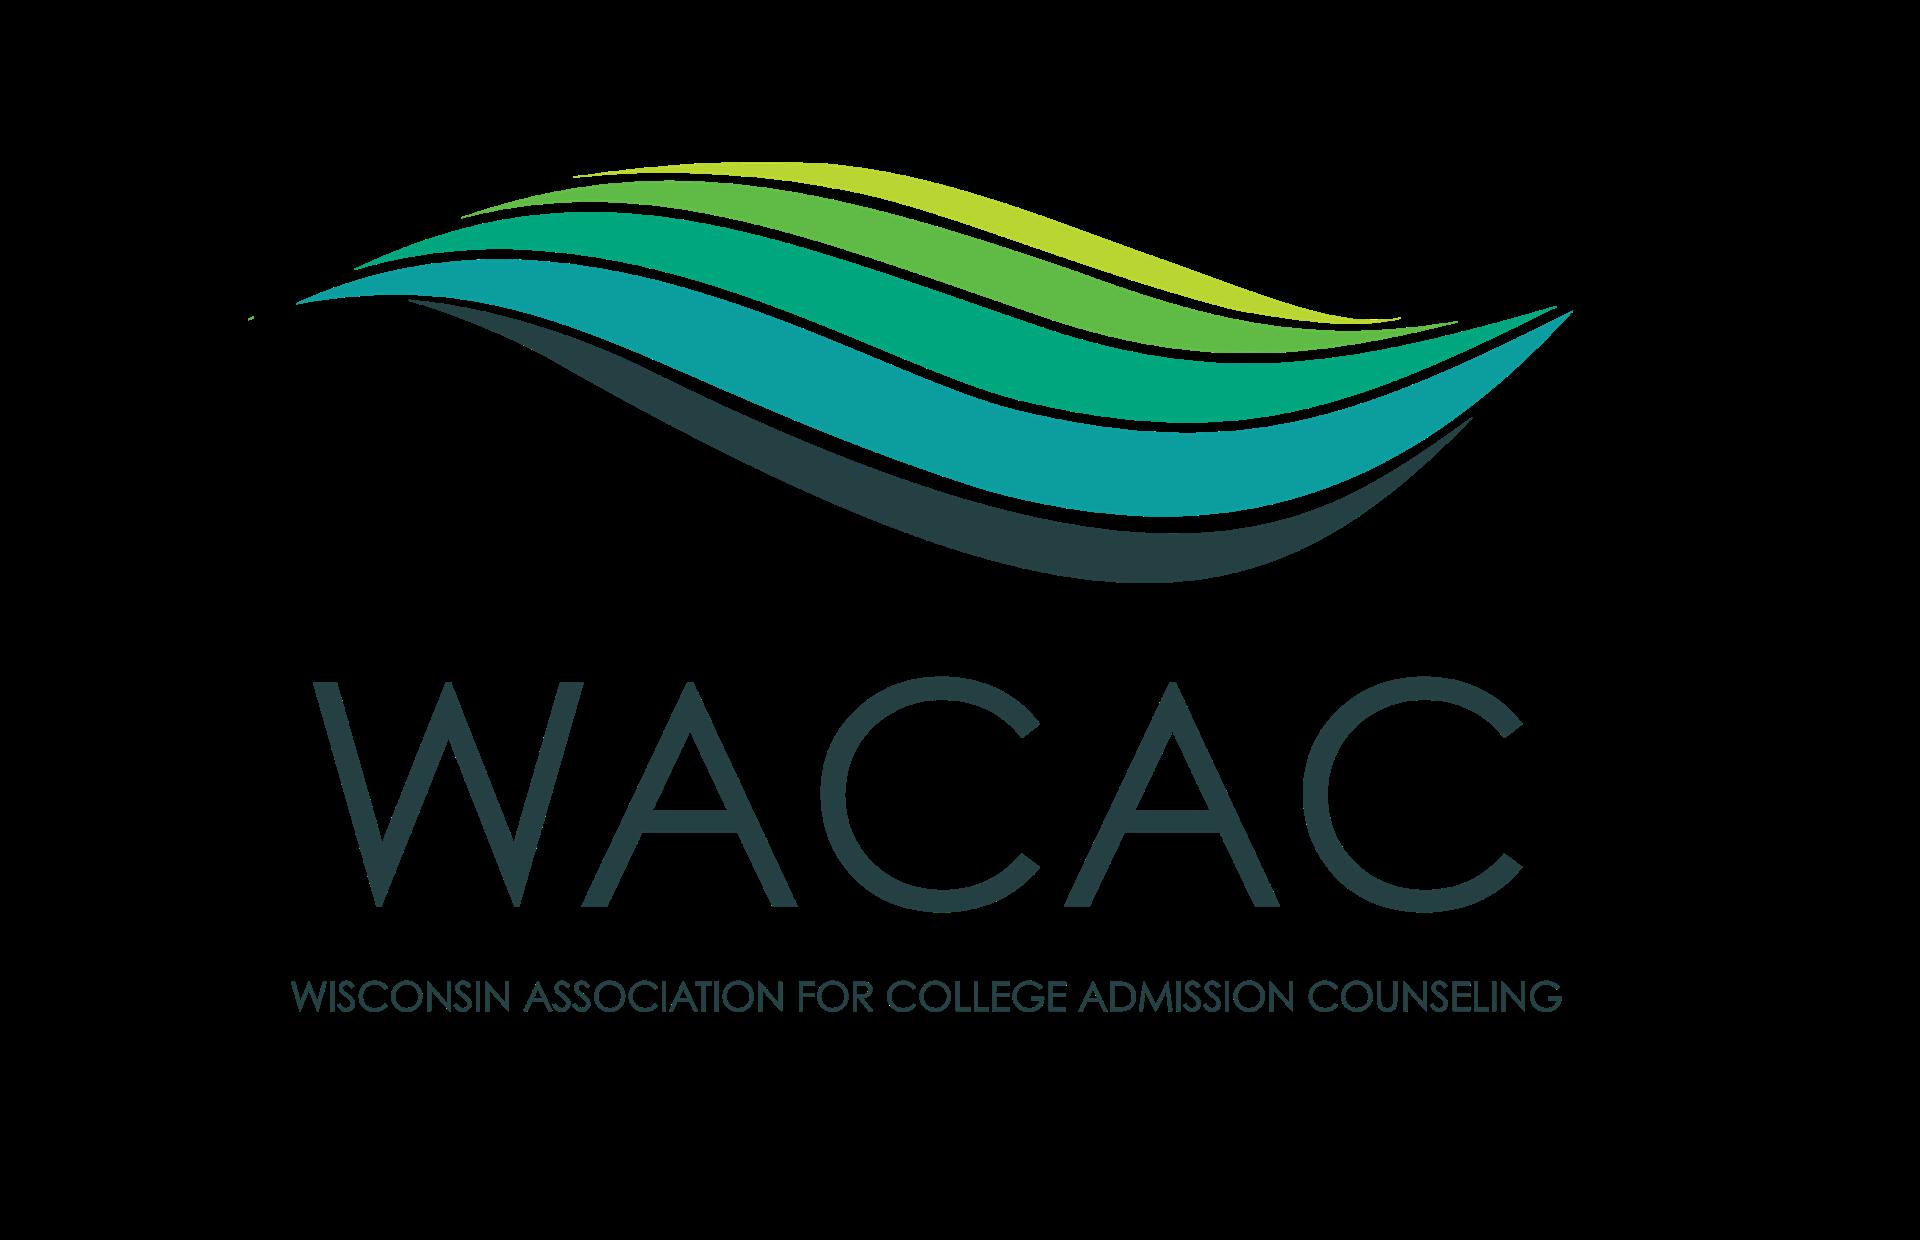 WACAC - Home